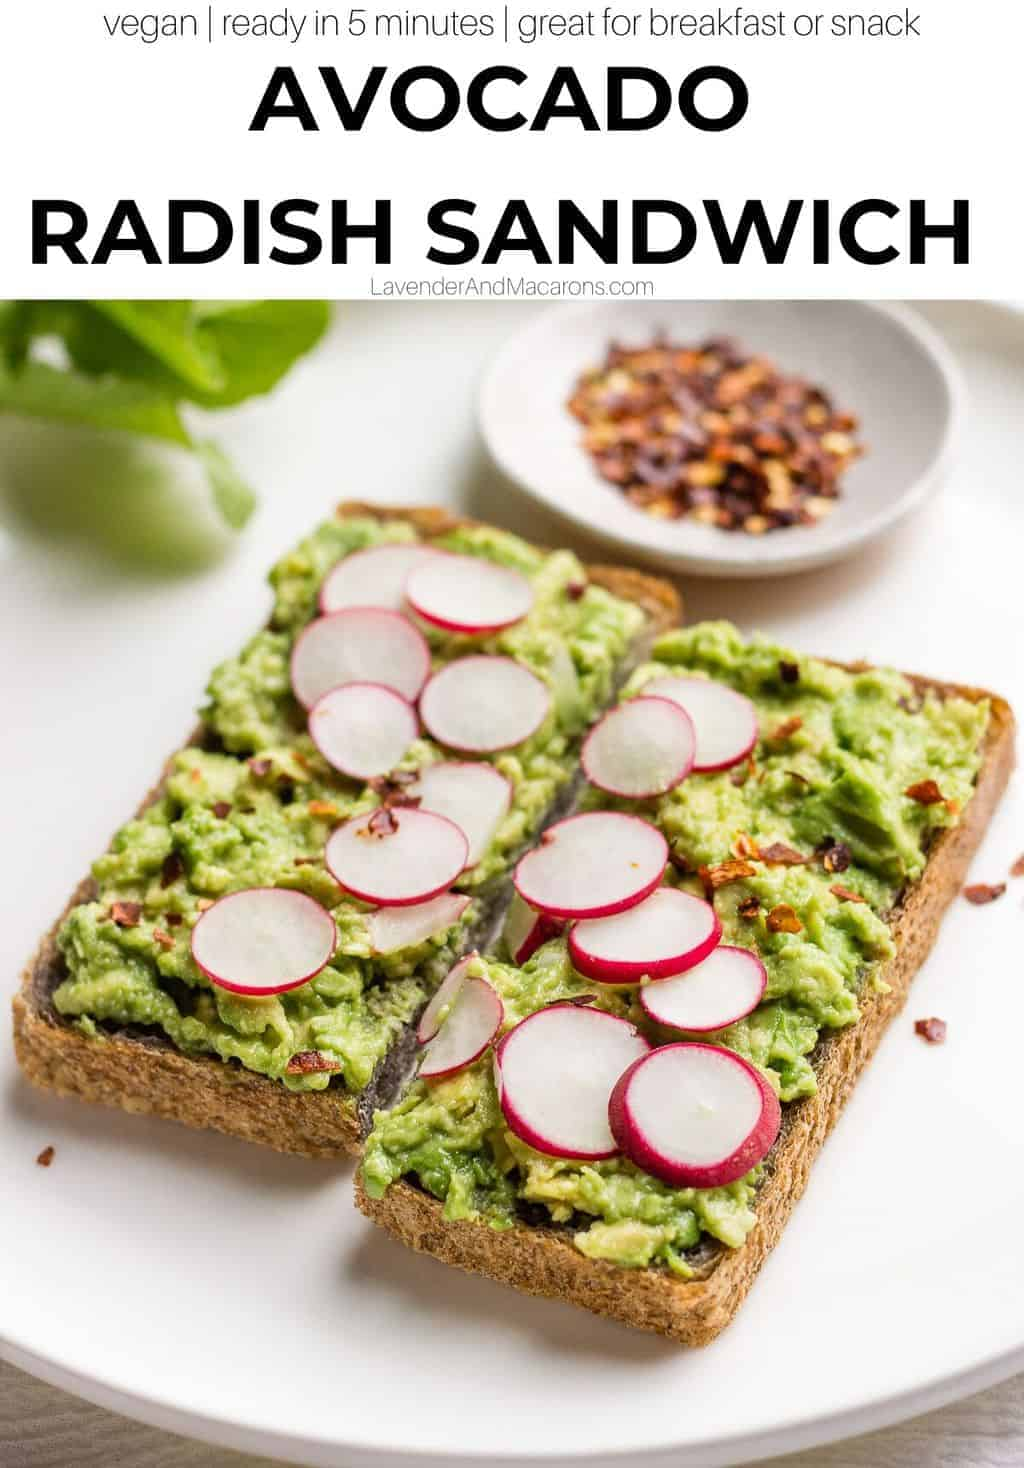 Avocado Radish Sandwich image with text overlay